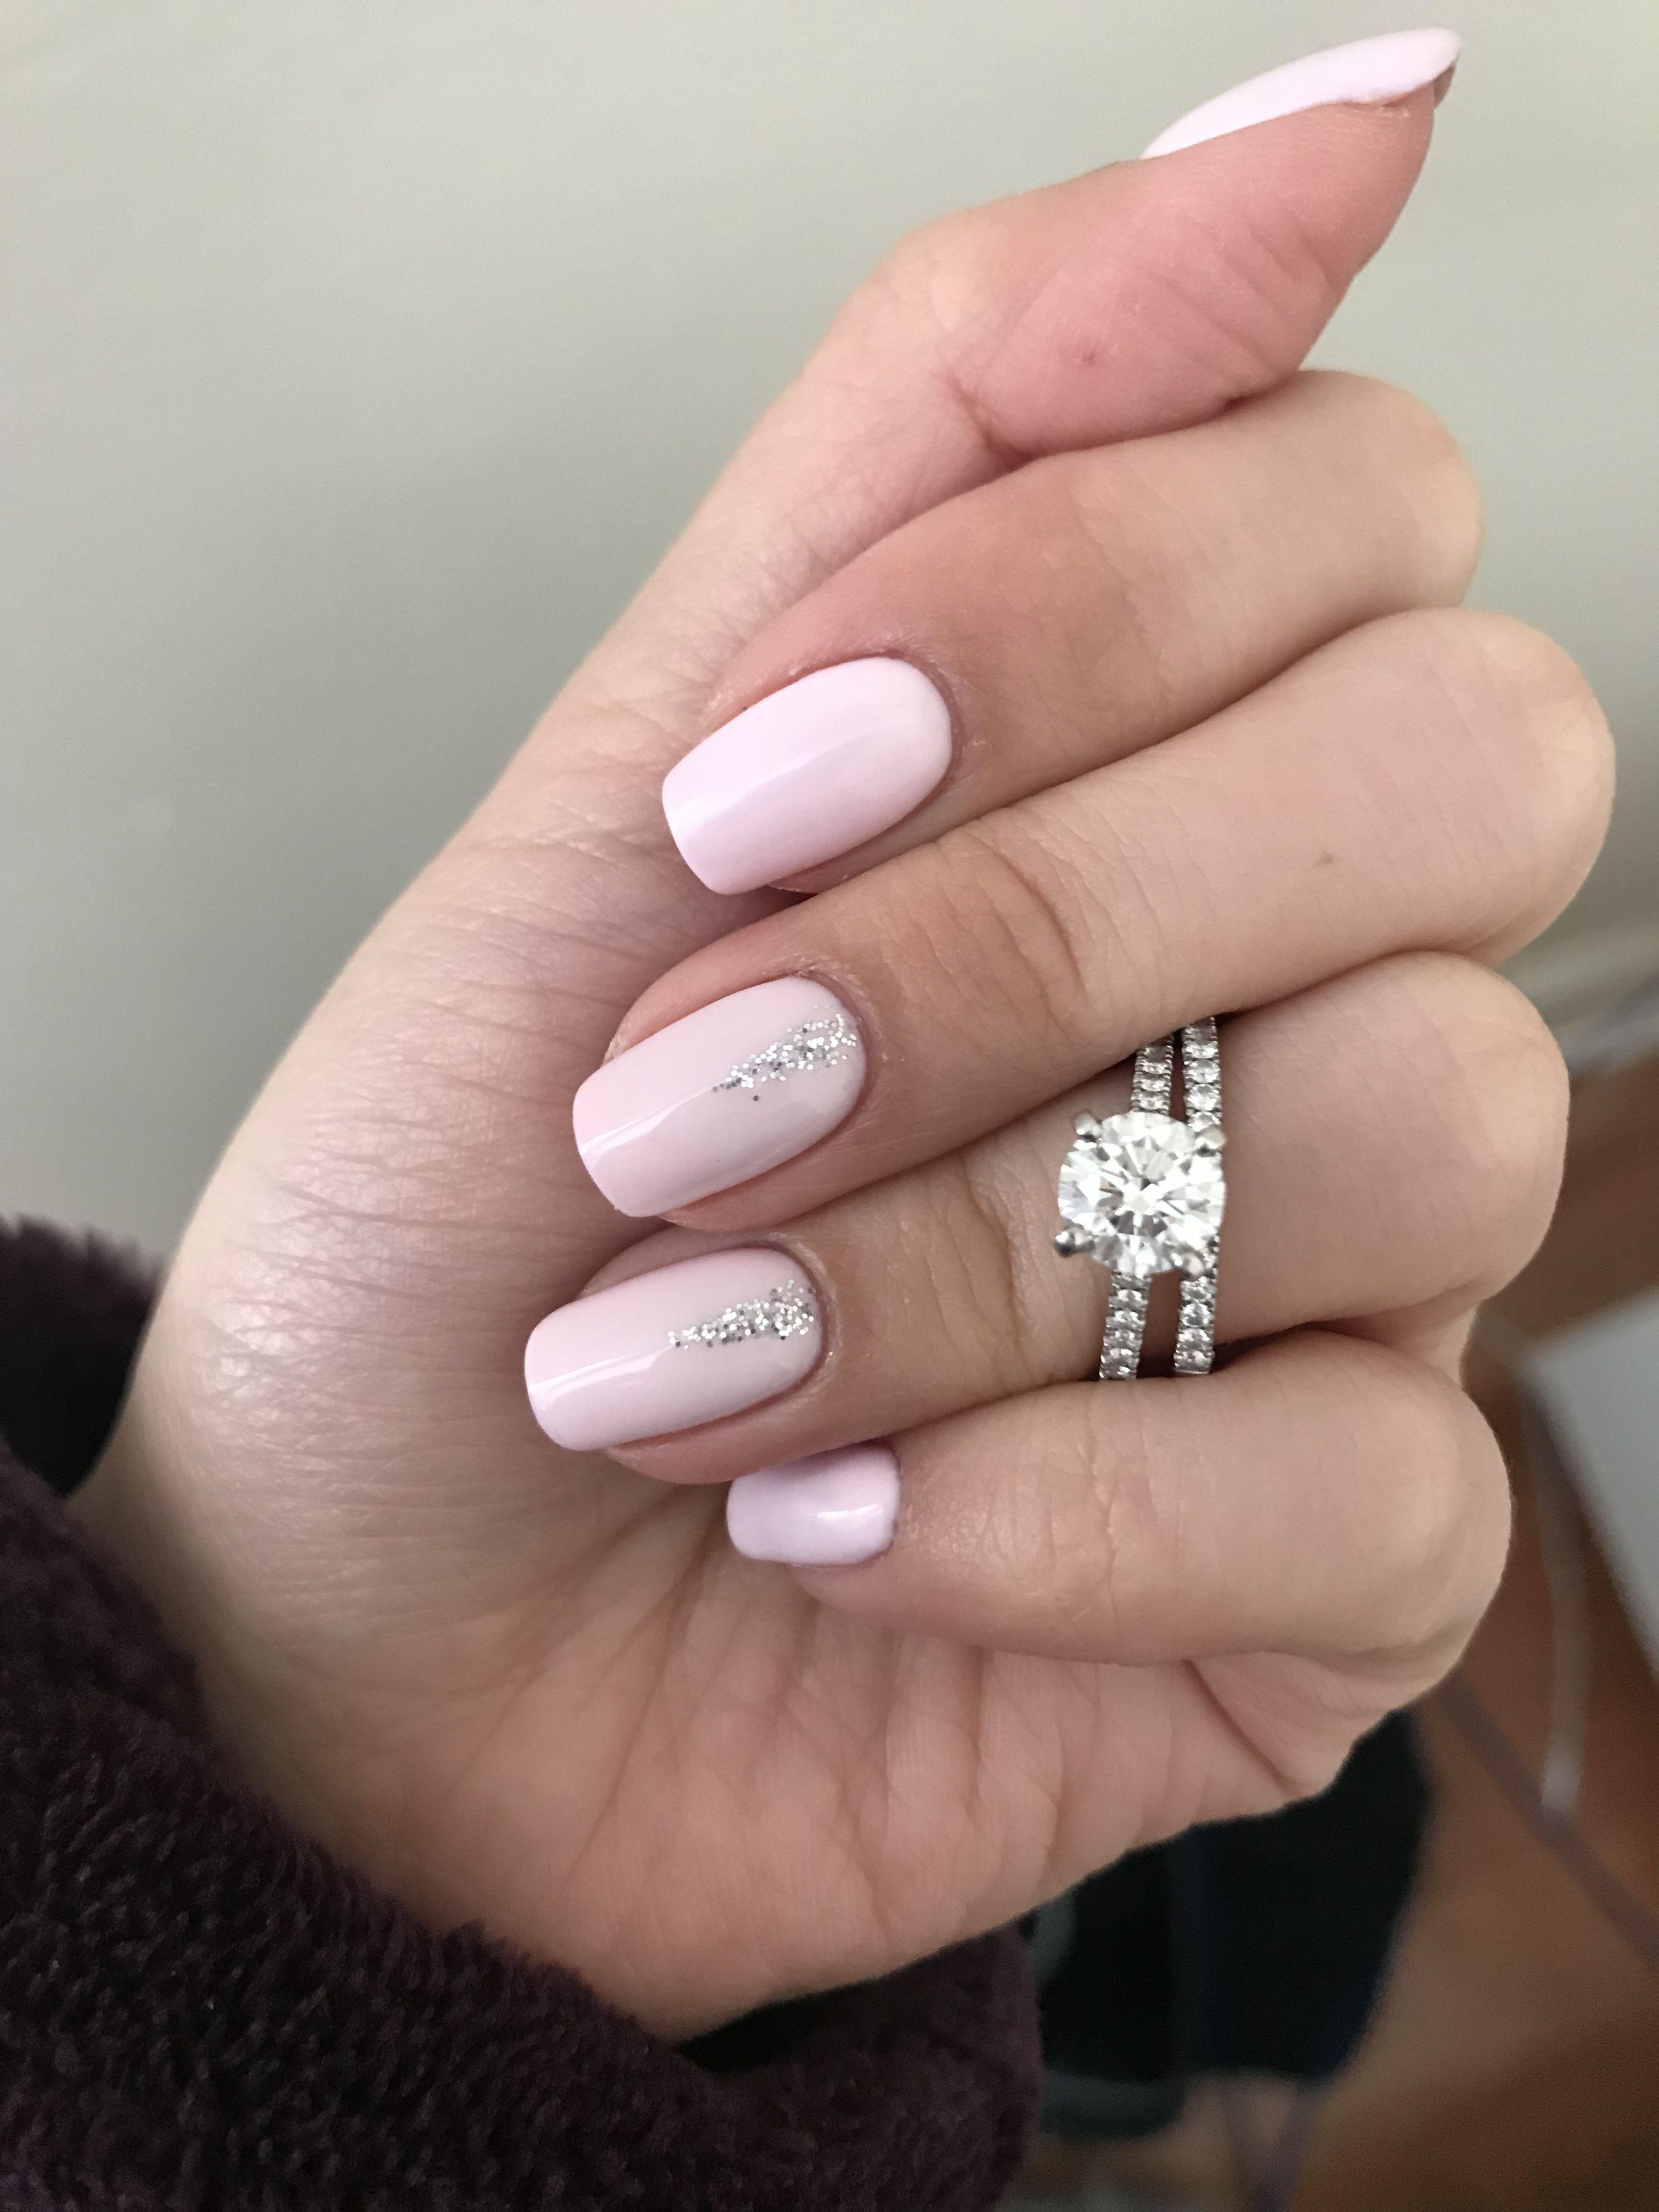 Engagement Ring Engagement Nails Designs Engagement Nails Wedding Day Nails